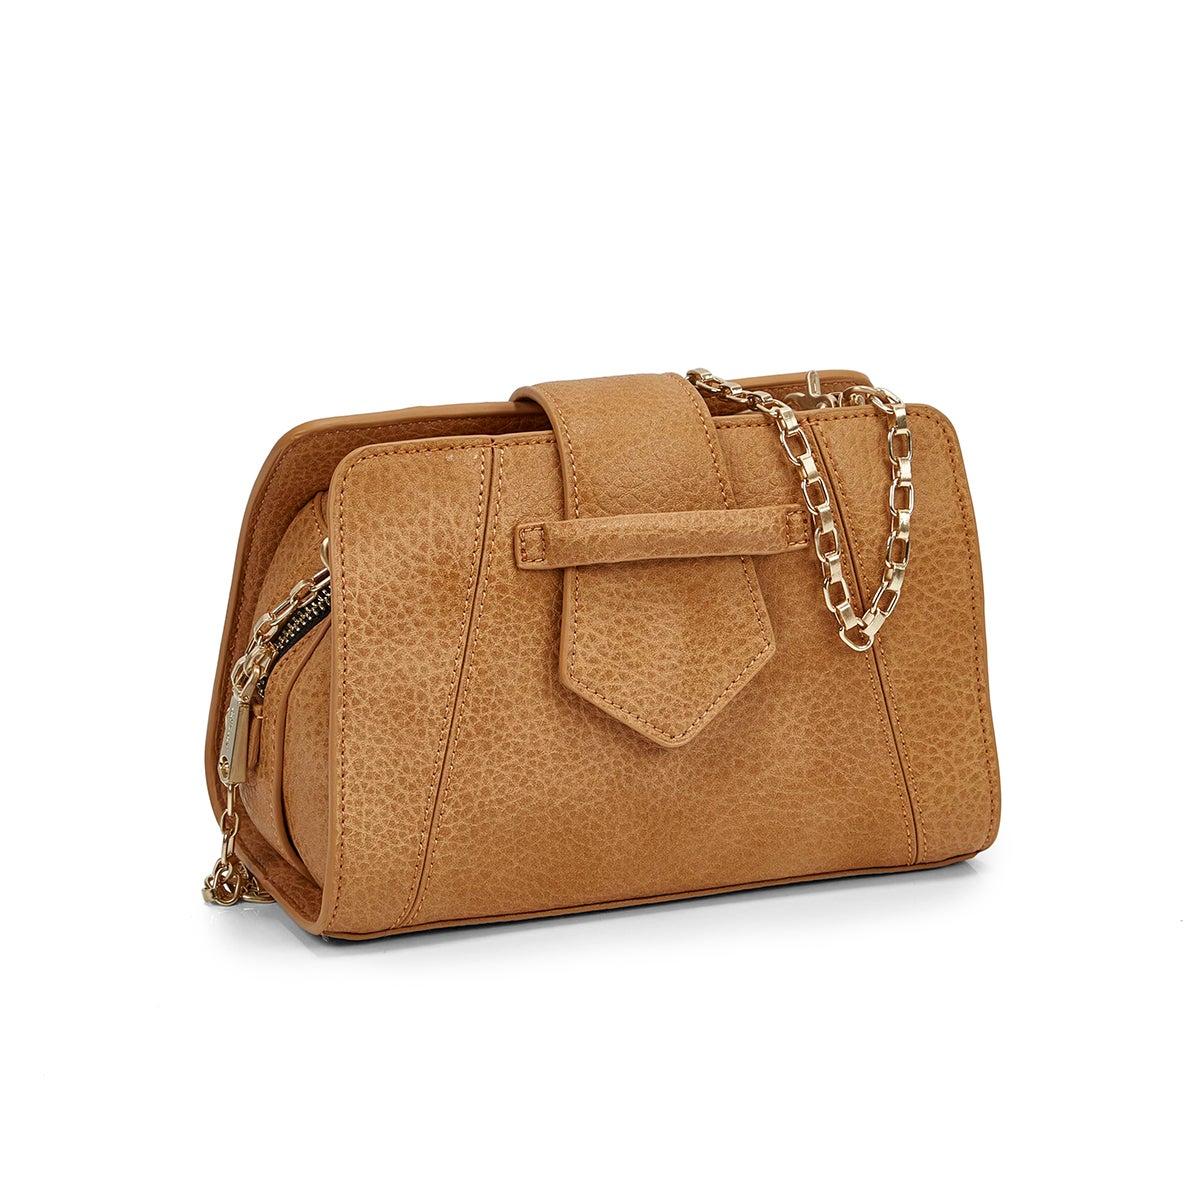 Women's 5604 MINI SADDLE camel cross body bag